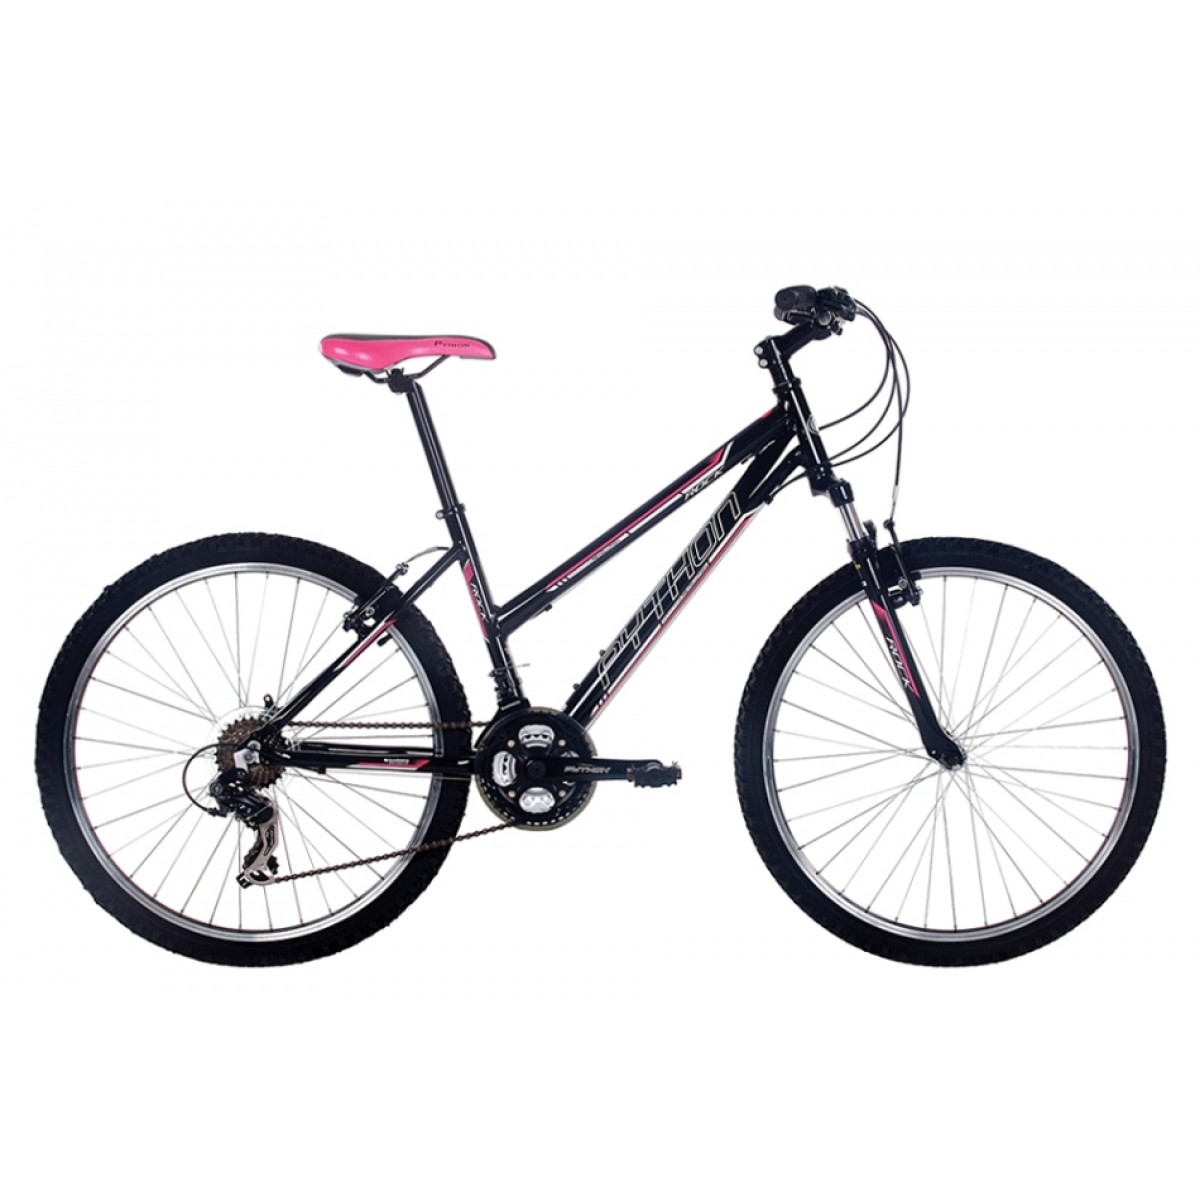 Bikes Bike